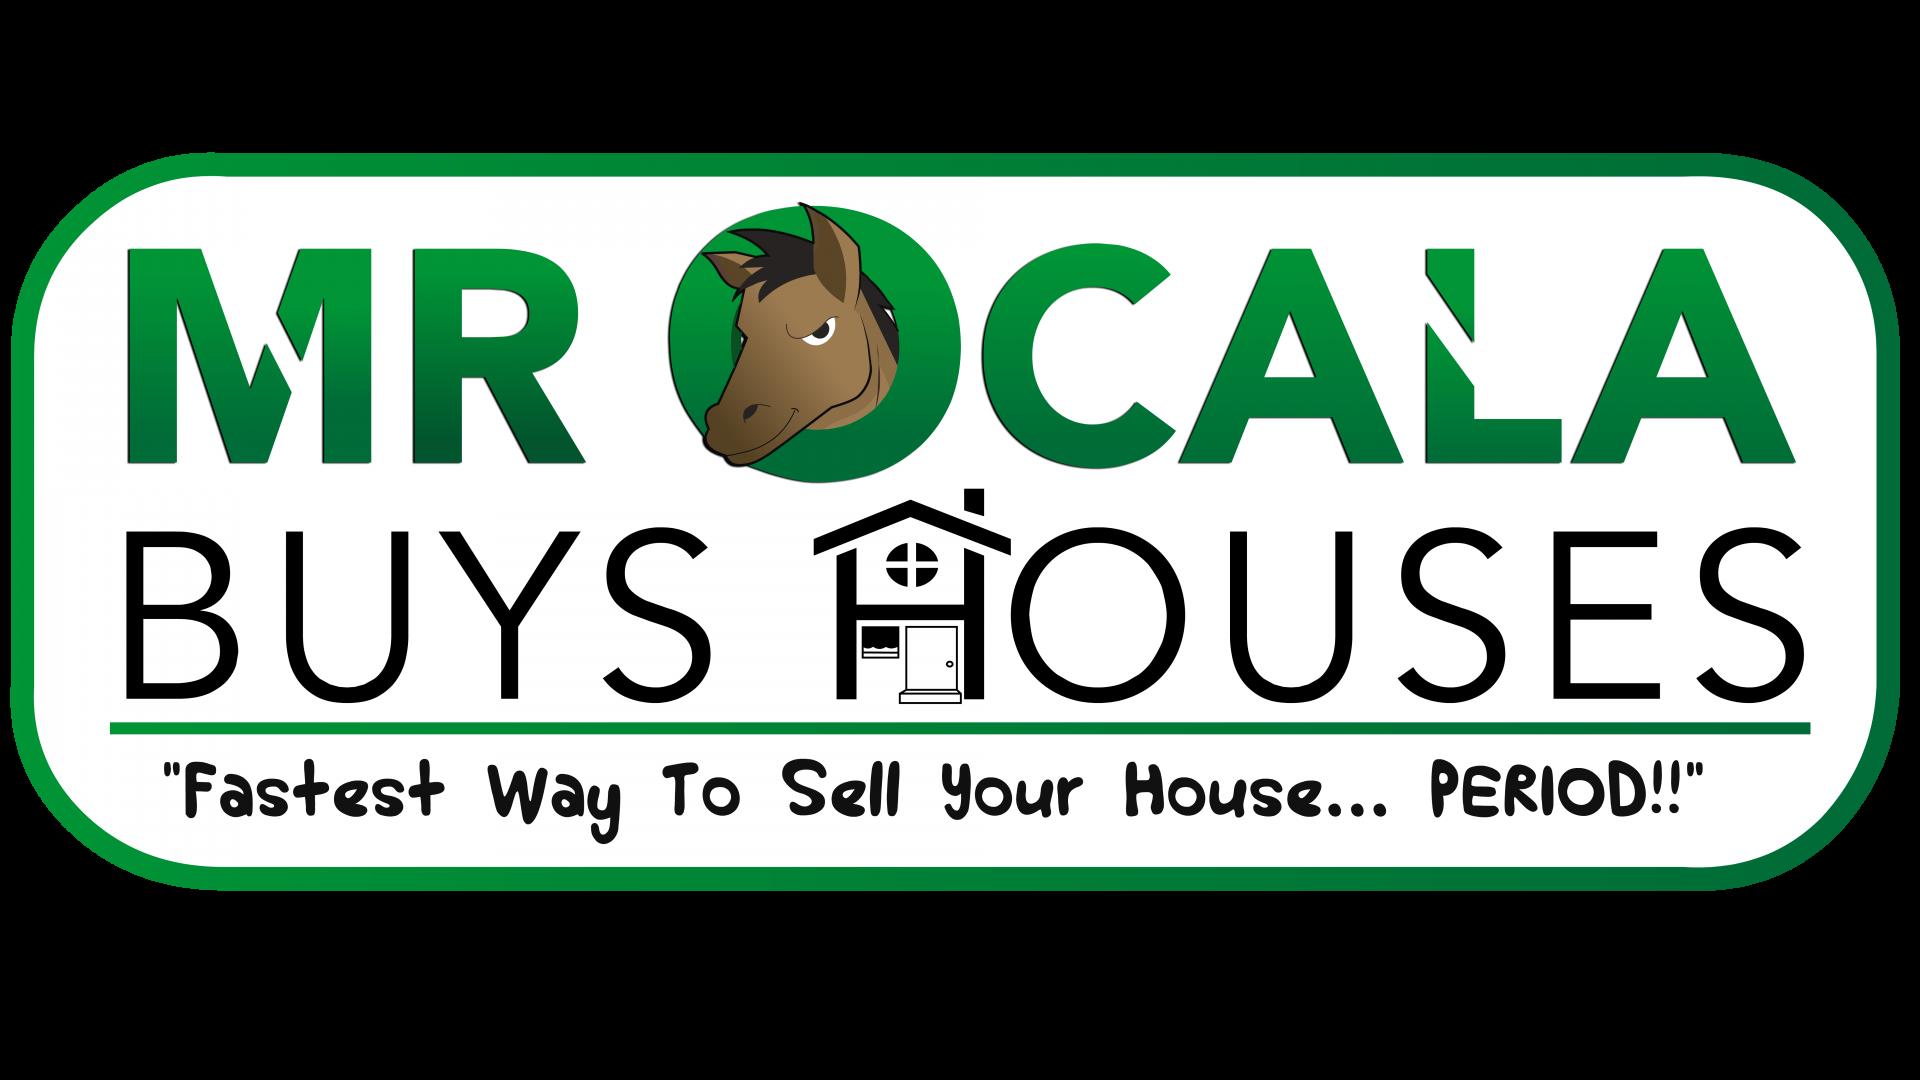 Mr Ocala Buys Houses logo